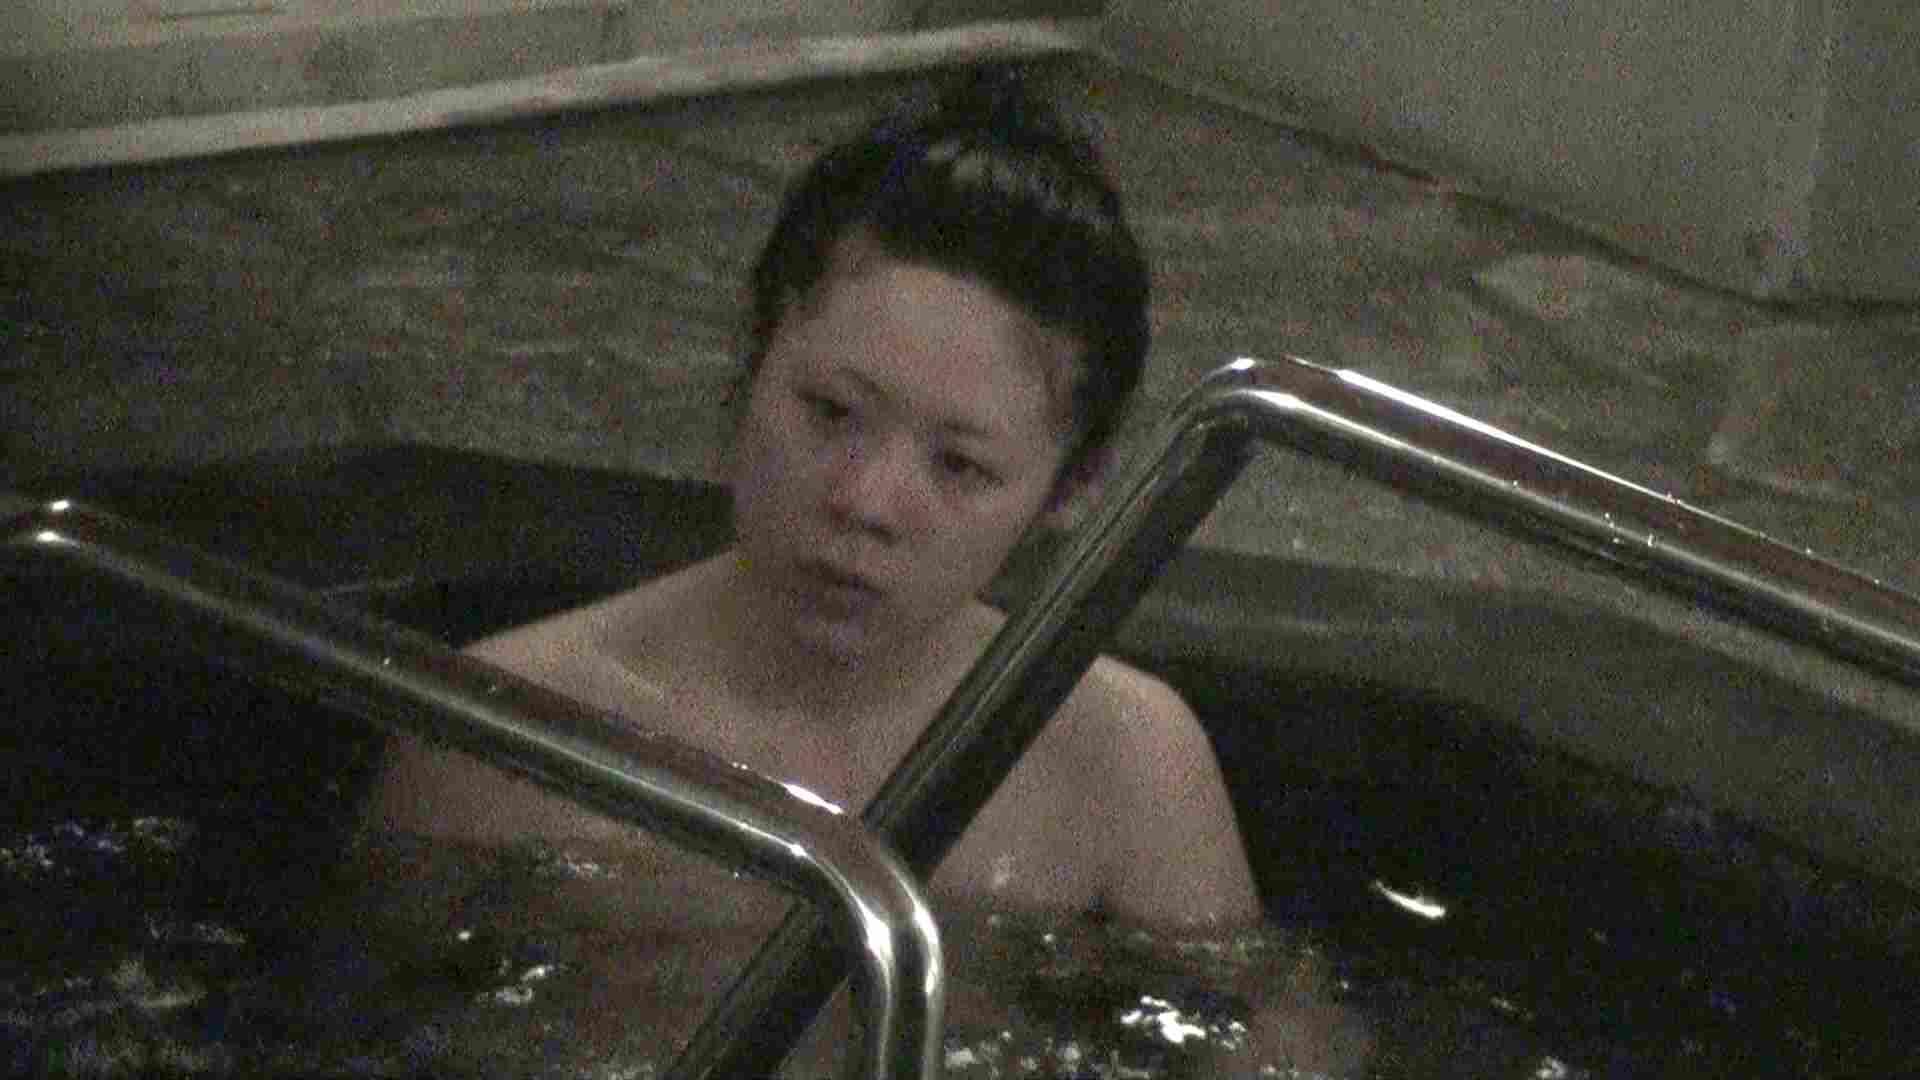 Aquaな露天風呂Vol.314 露天風呂編 | 盗撮シリーズ  107PIX 69